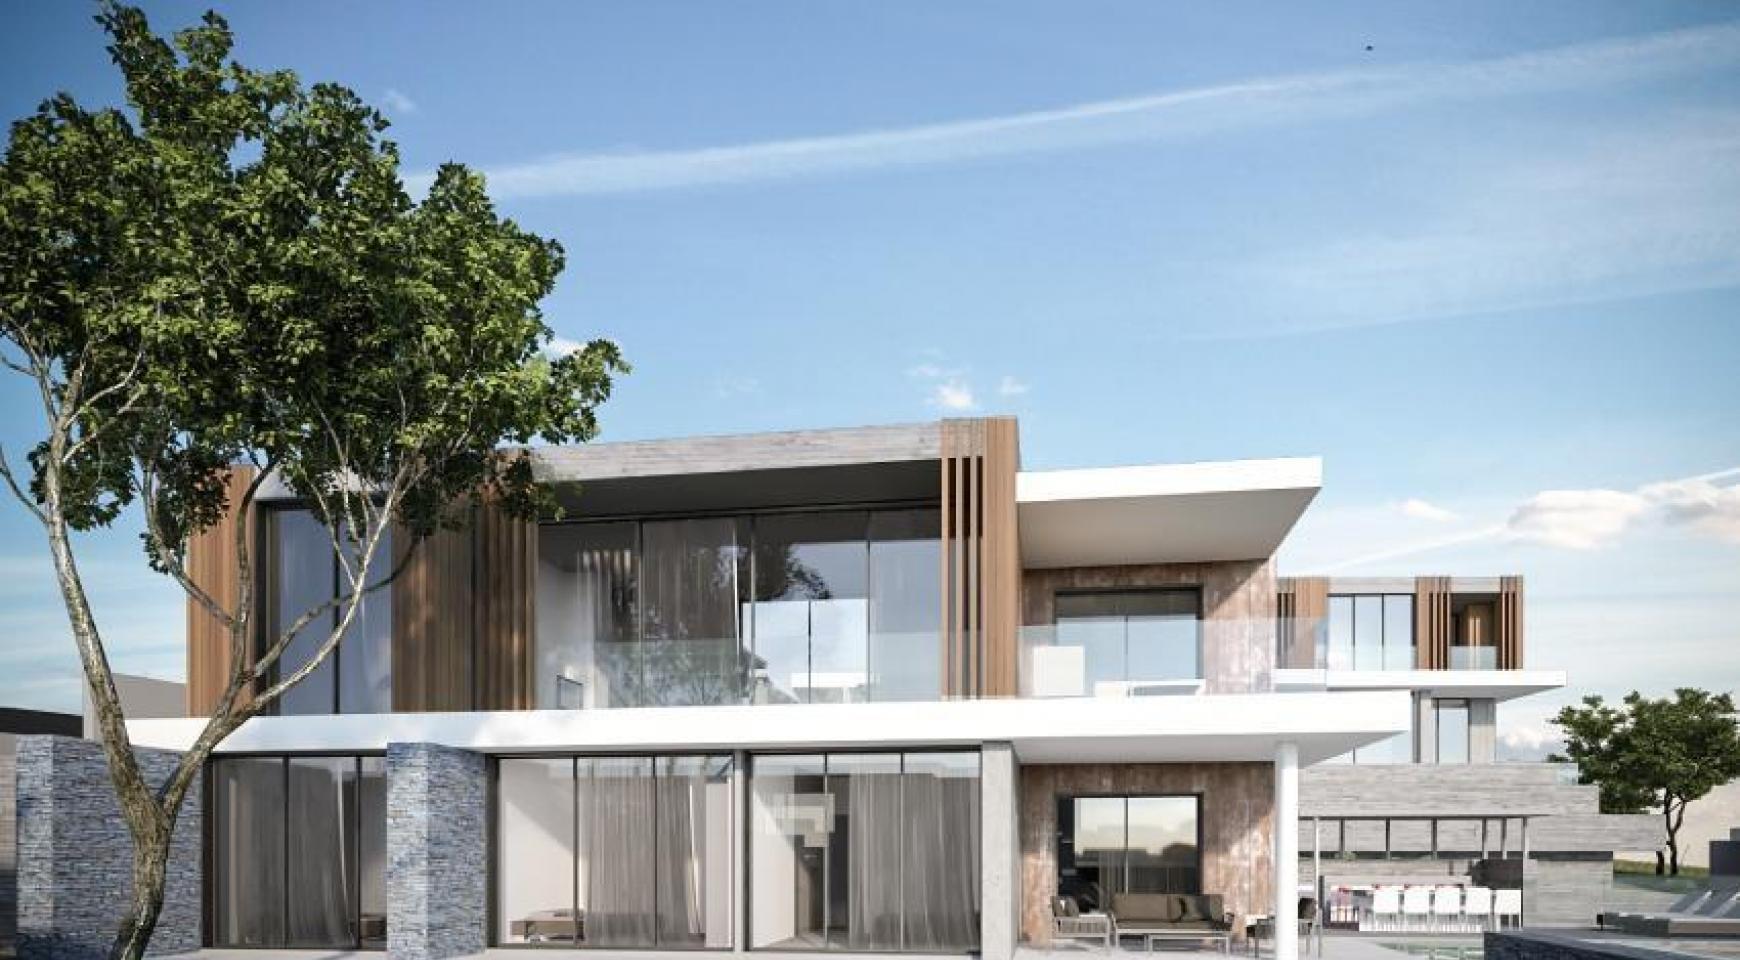 Exclusive 3 Bedroom Villa with Stunning Views in Germasogeia - 2